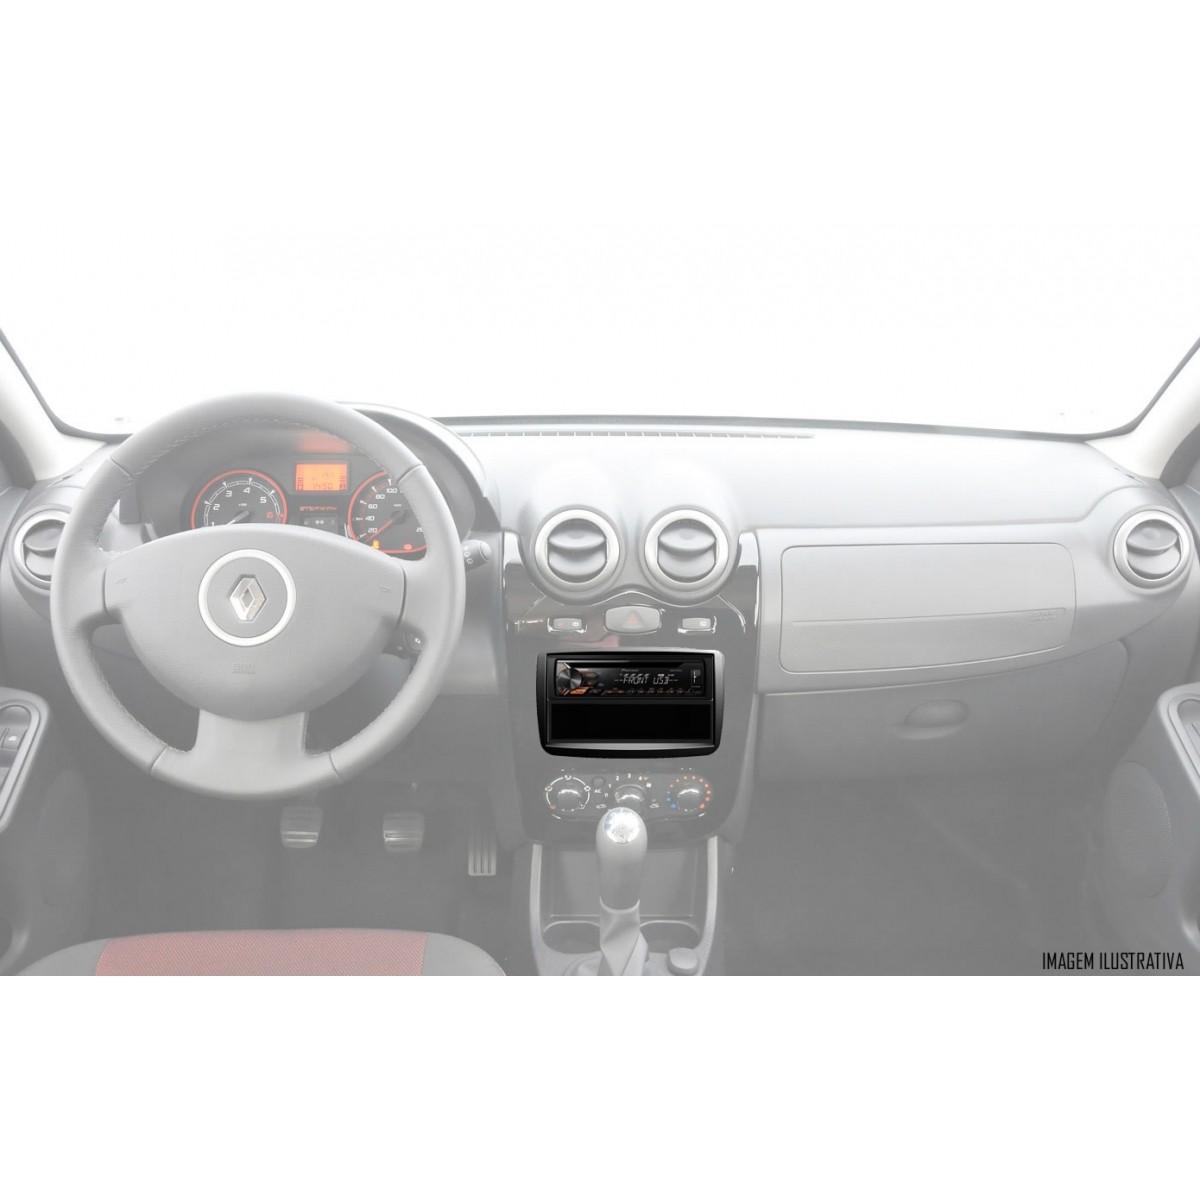 Moldura De Painel 1 Din Renault Kwid Oroch Duster Sandero Logan Automatico 2012  Em Diante + Suportes De Fixação Laterais - Preto